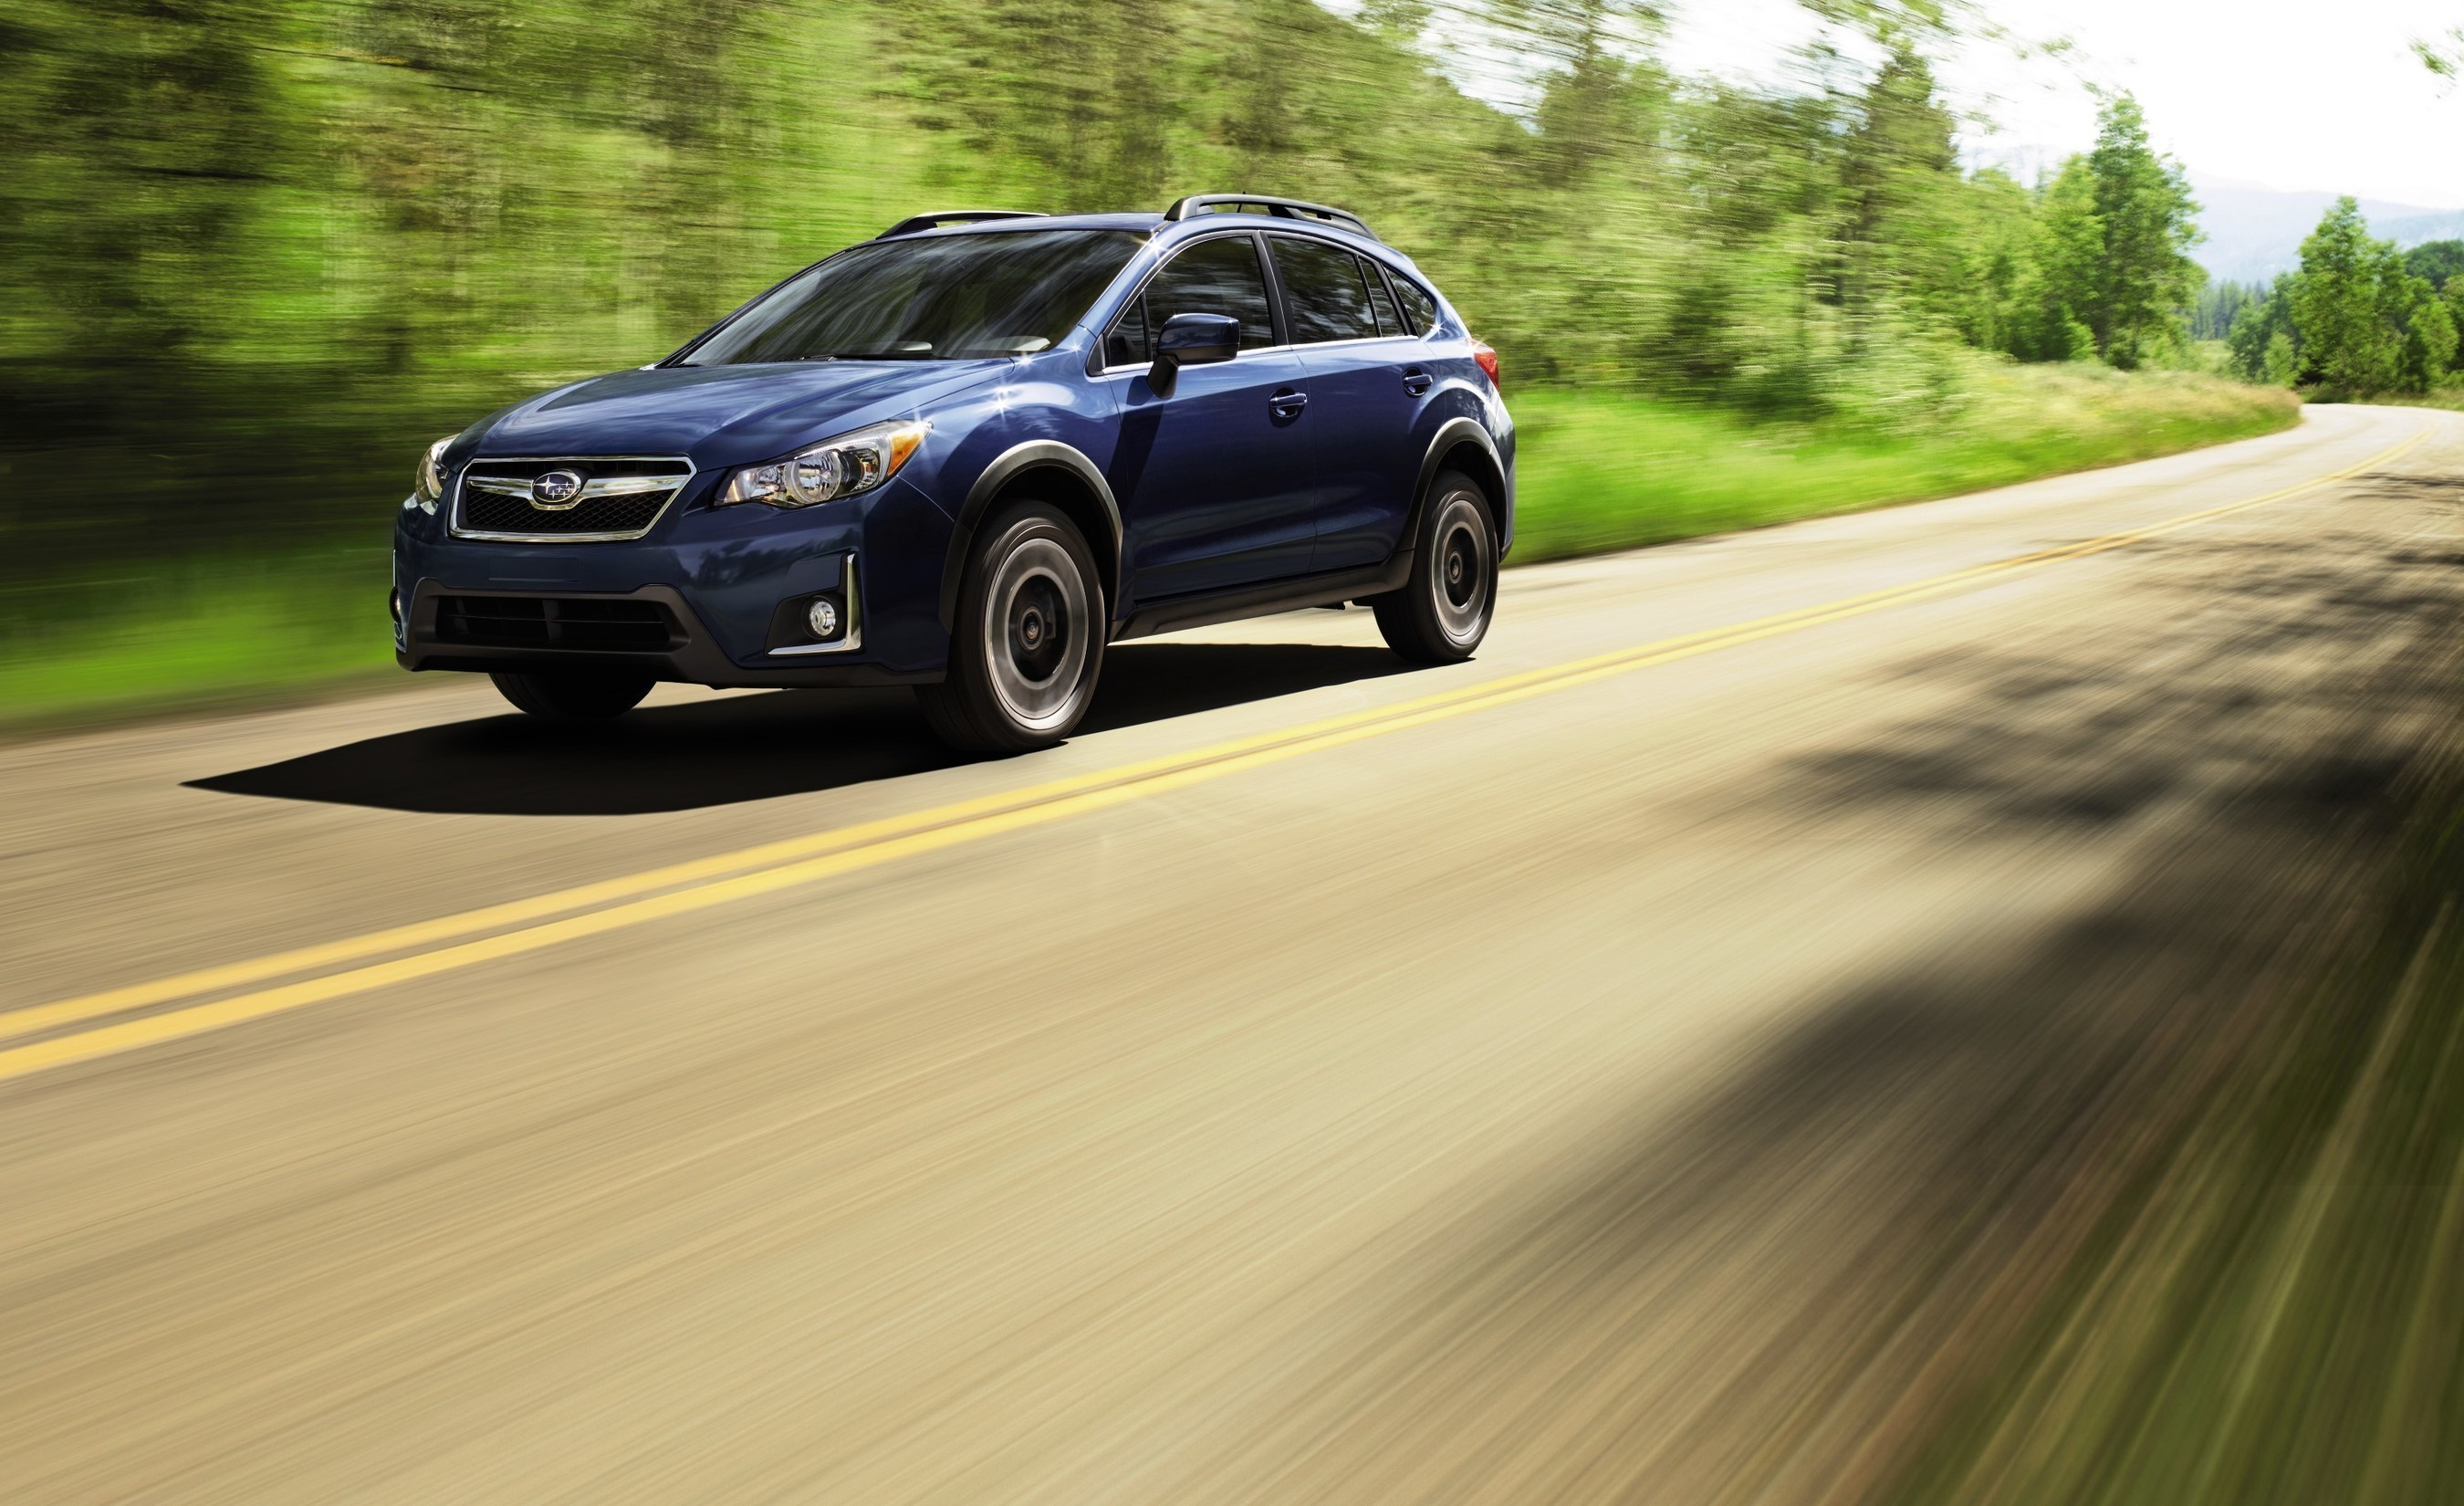 Subaru Announces Pricing On 2017 Crosstrek Models